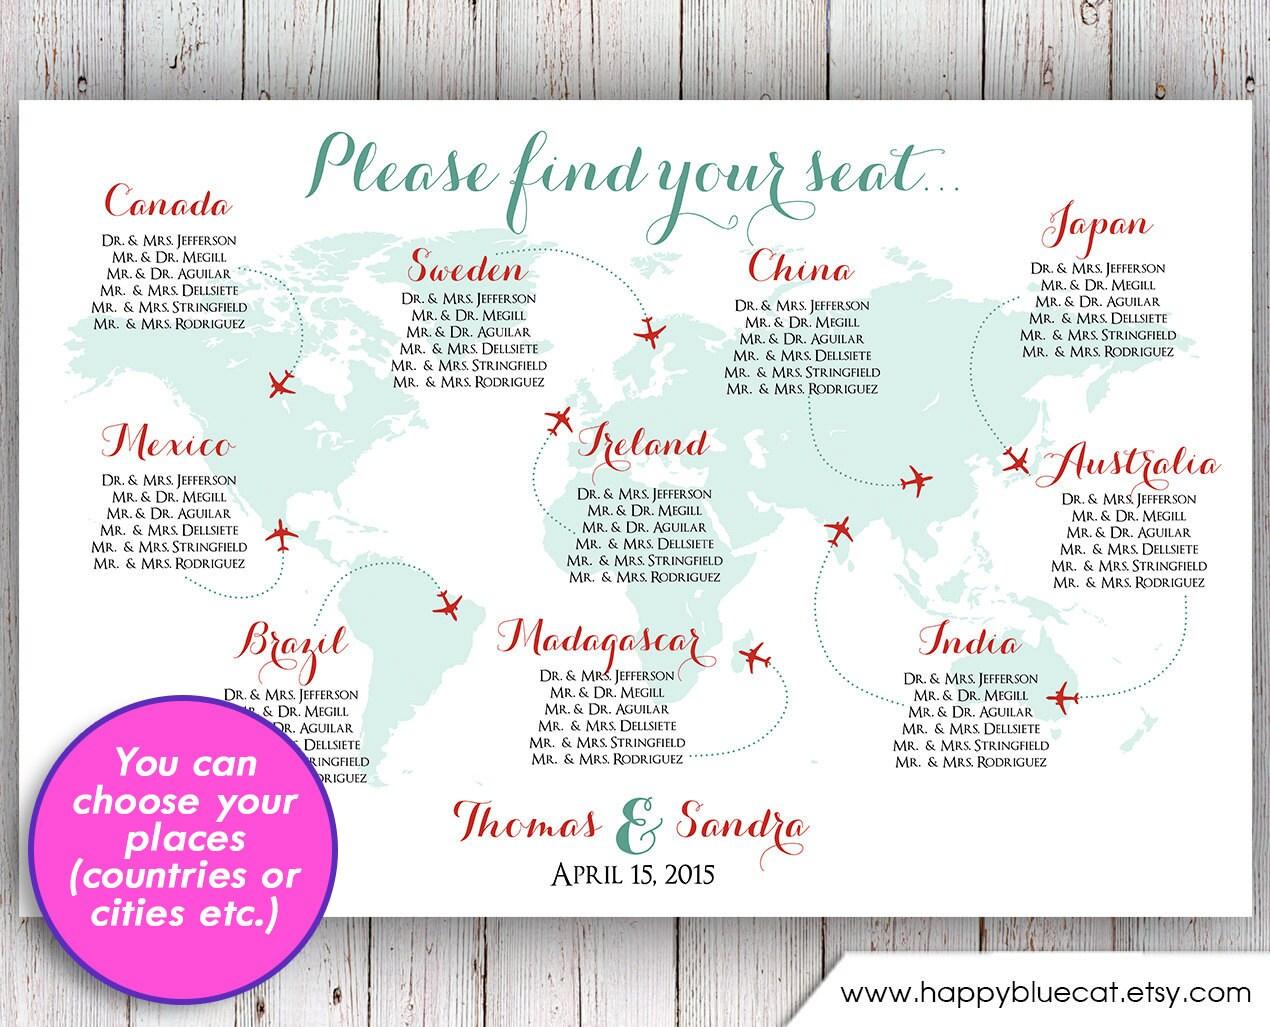 Wedding seating chart rush service world map plane travel zoom gumiabroncs Choice Image